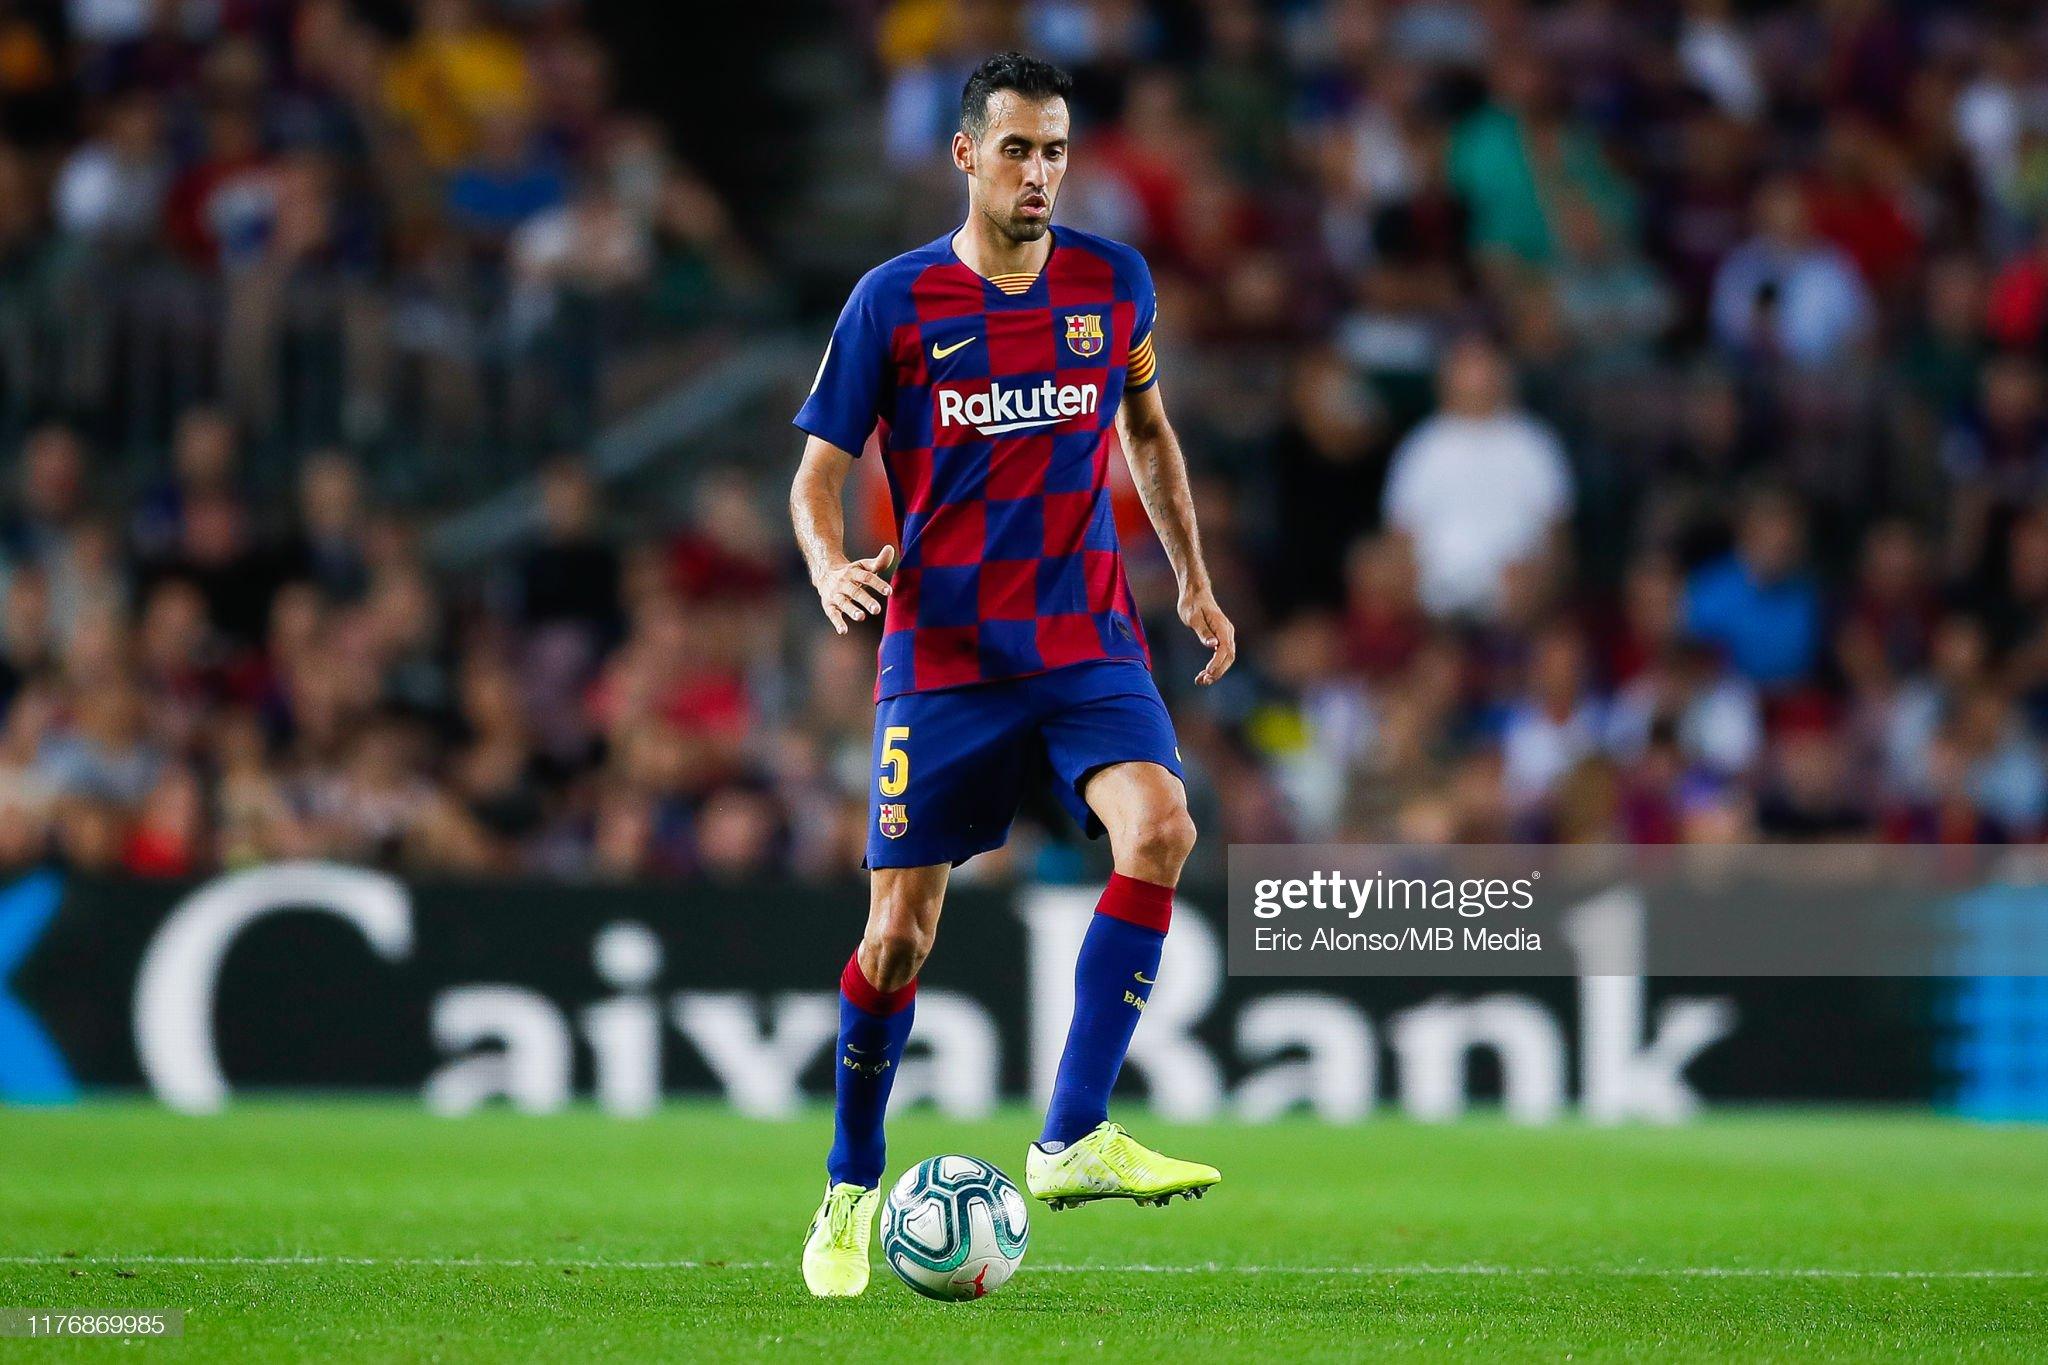 صور مباراة : برشلونة - فياريال 2-1 ( 24-09-2019 )  Sergi-busquets-of-fc-barcelona-passes-the-ball-during-the-liga-match-picture-id1176869985?s=2048x2048